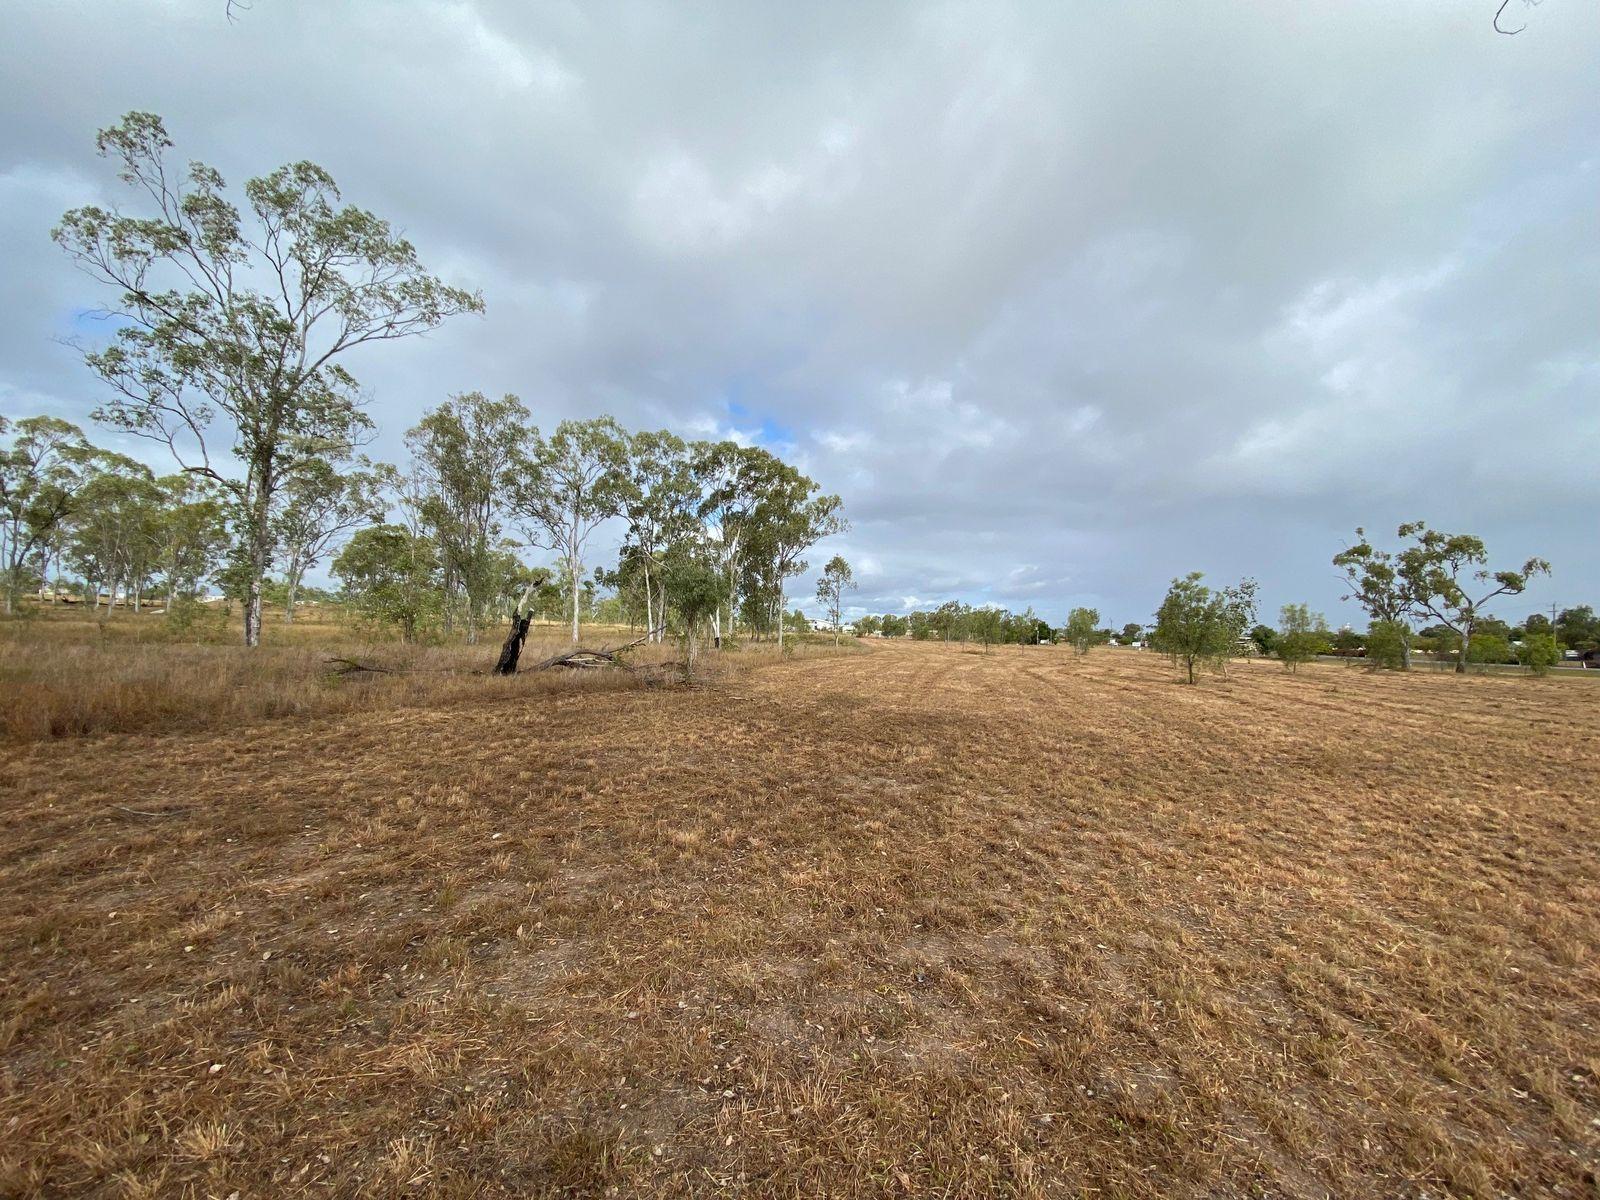 42-43 Peak Downs Highway, Nebo, QLD 4742